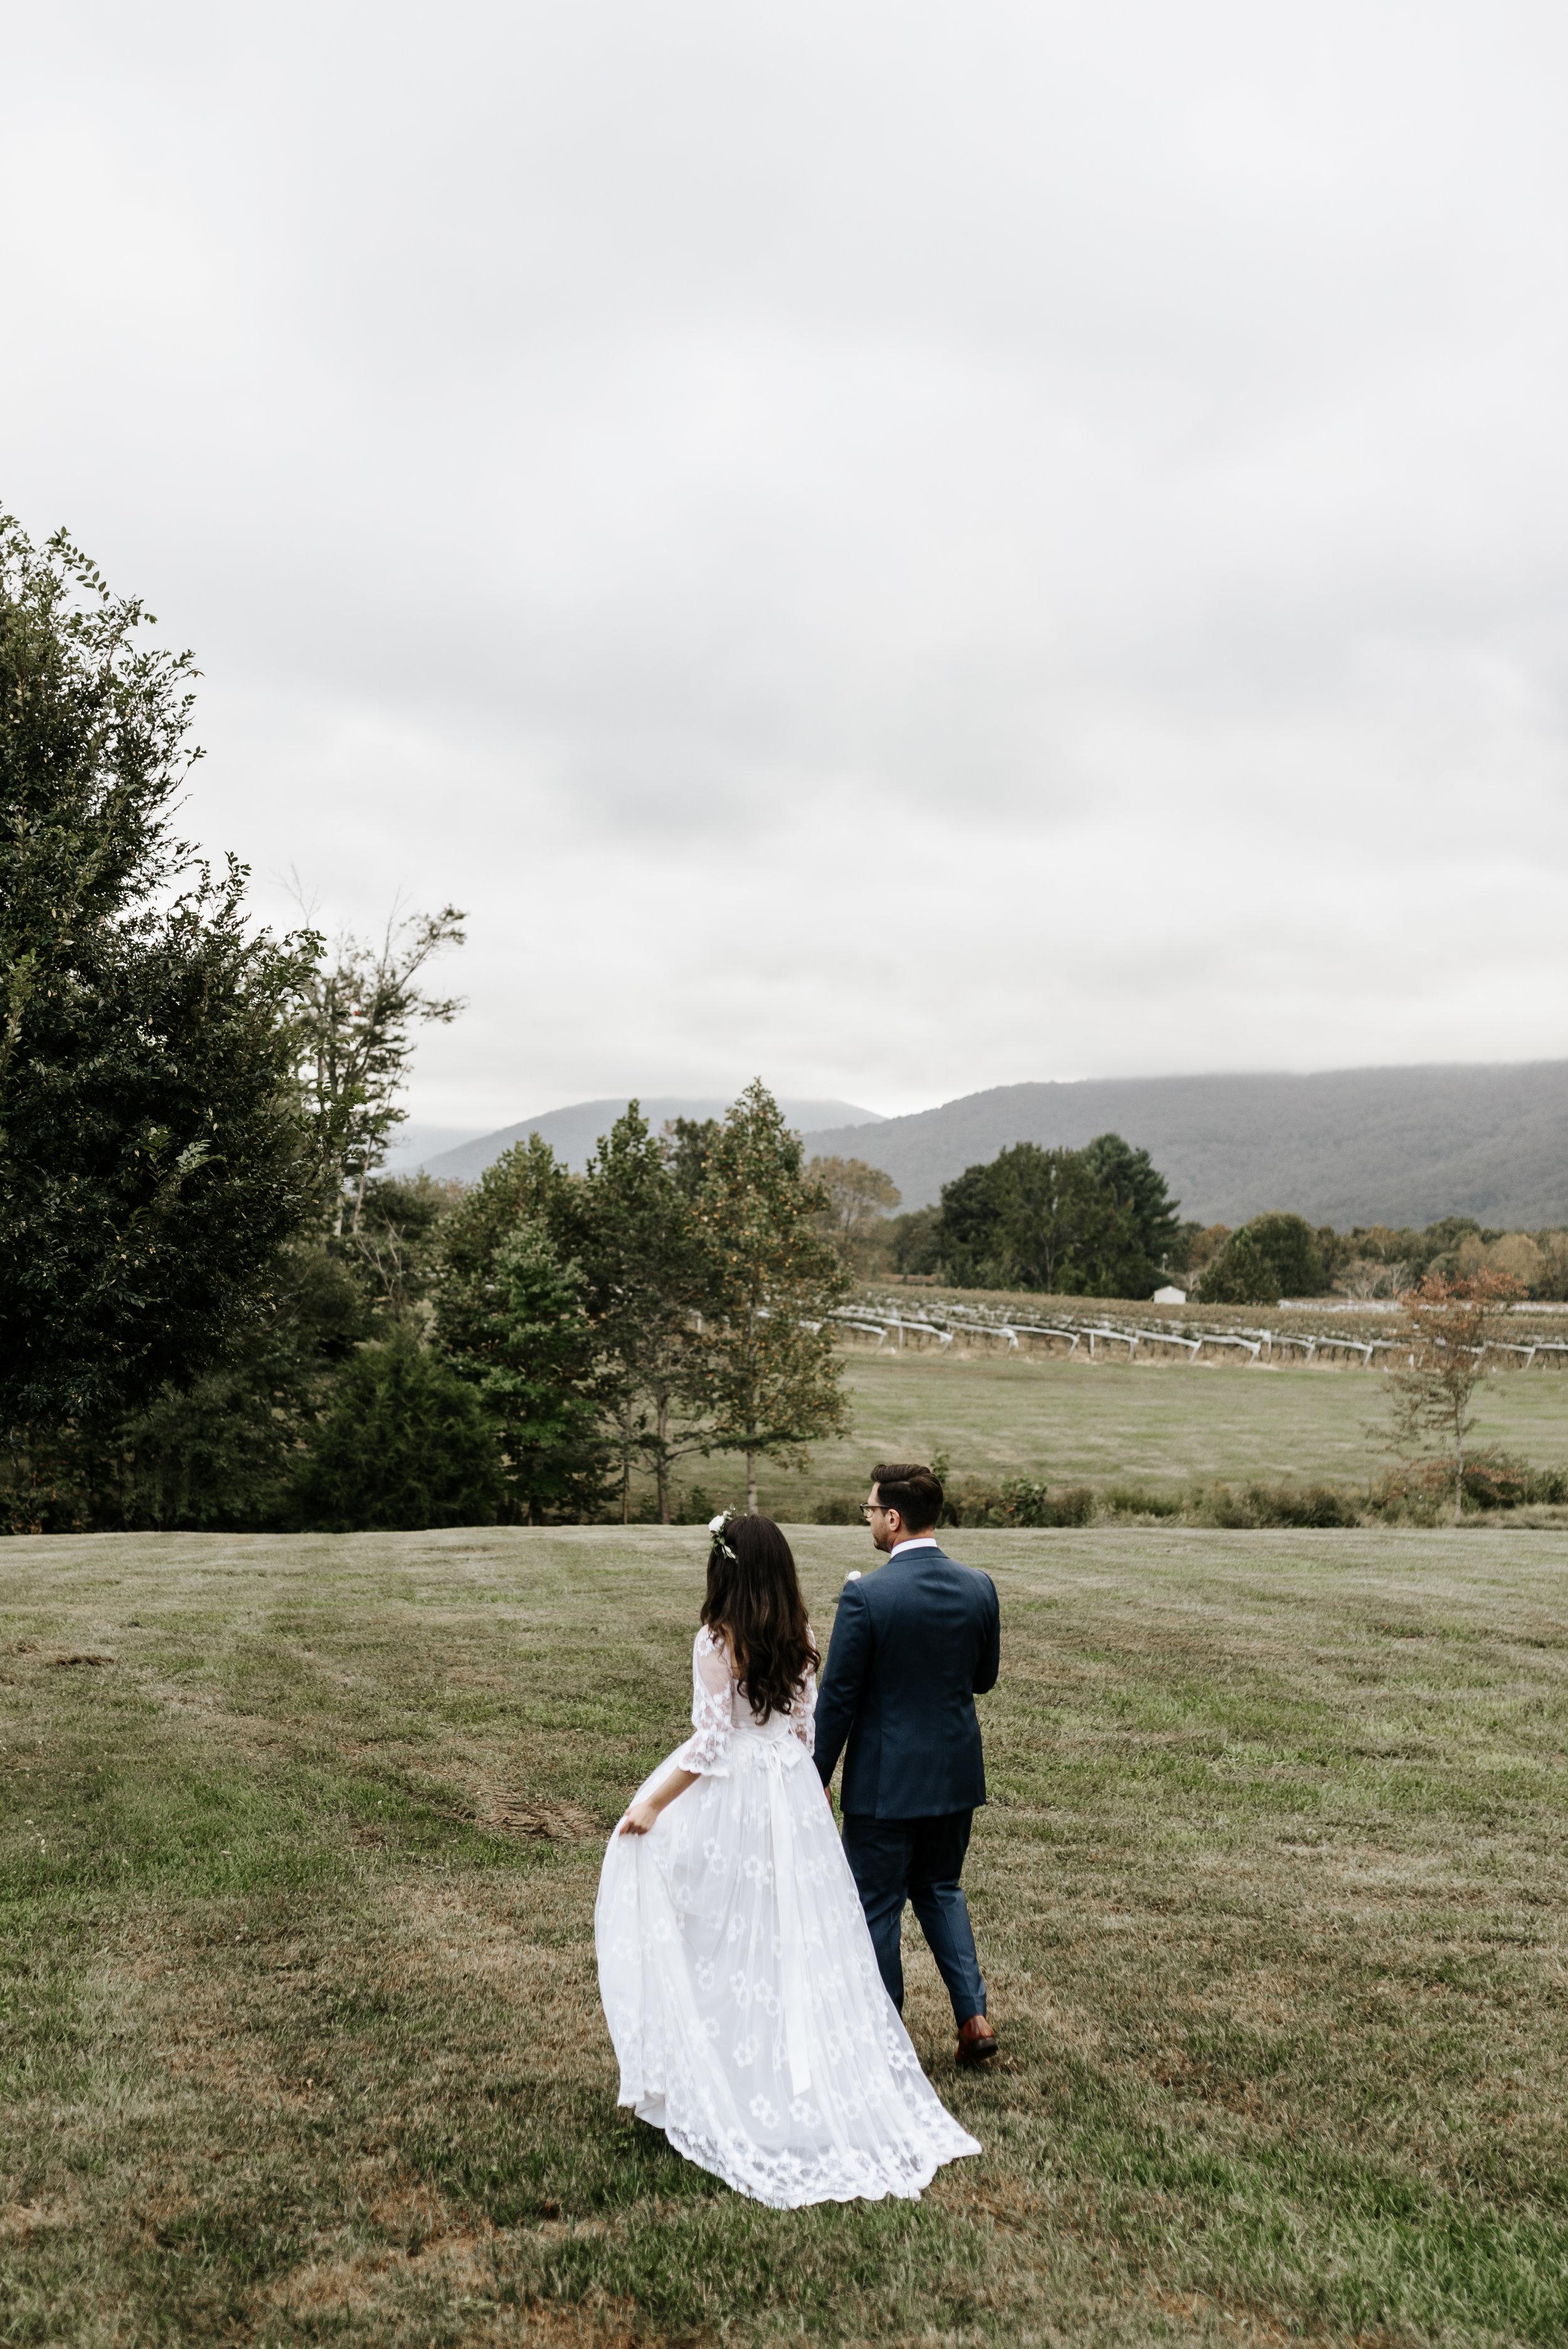 Veritas-Vineyards-and-Winery-Wedding-Photography-Afton-Virginia-Yasmin-Seth-Photography-by-V-9266.jpg